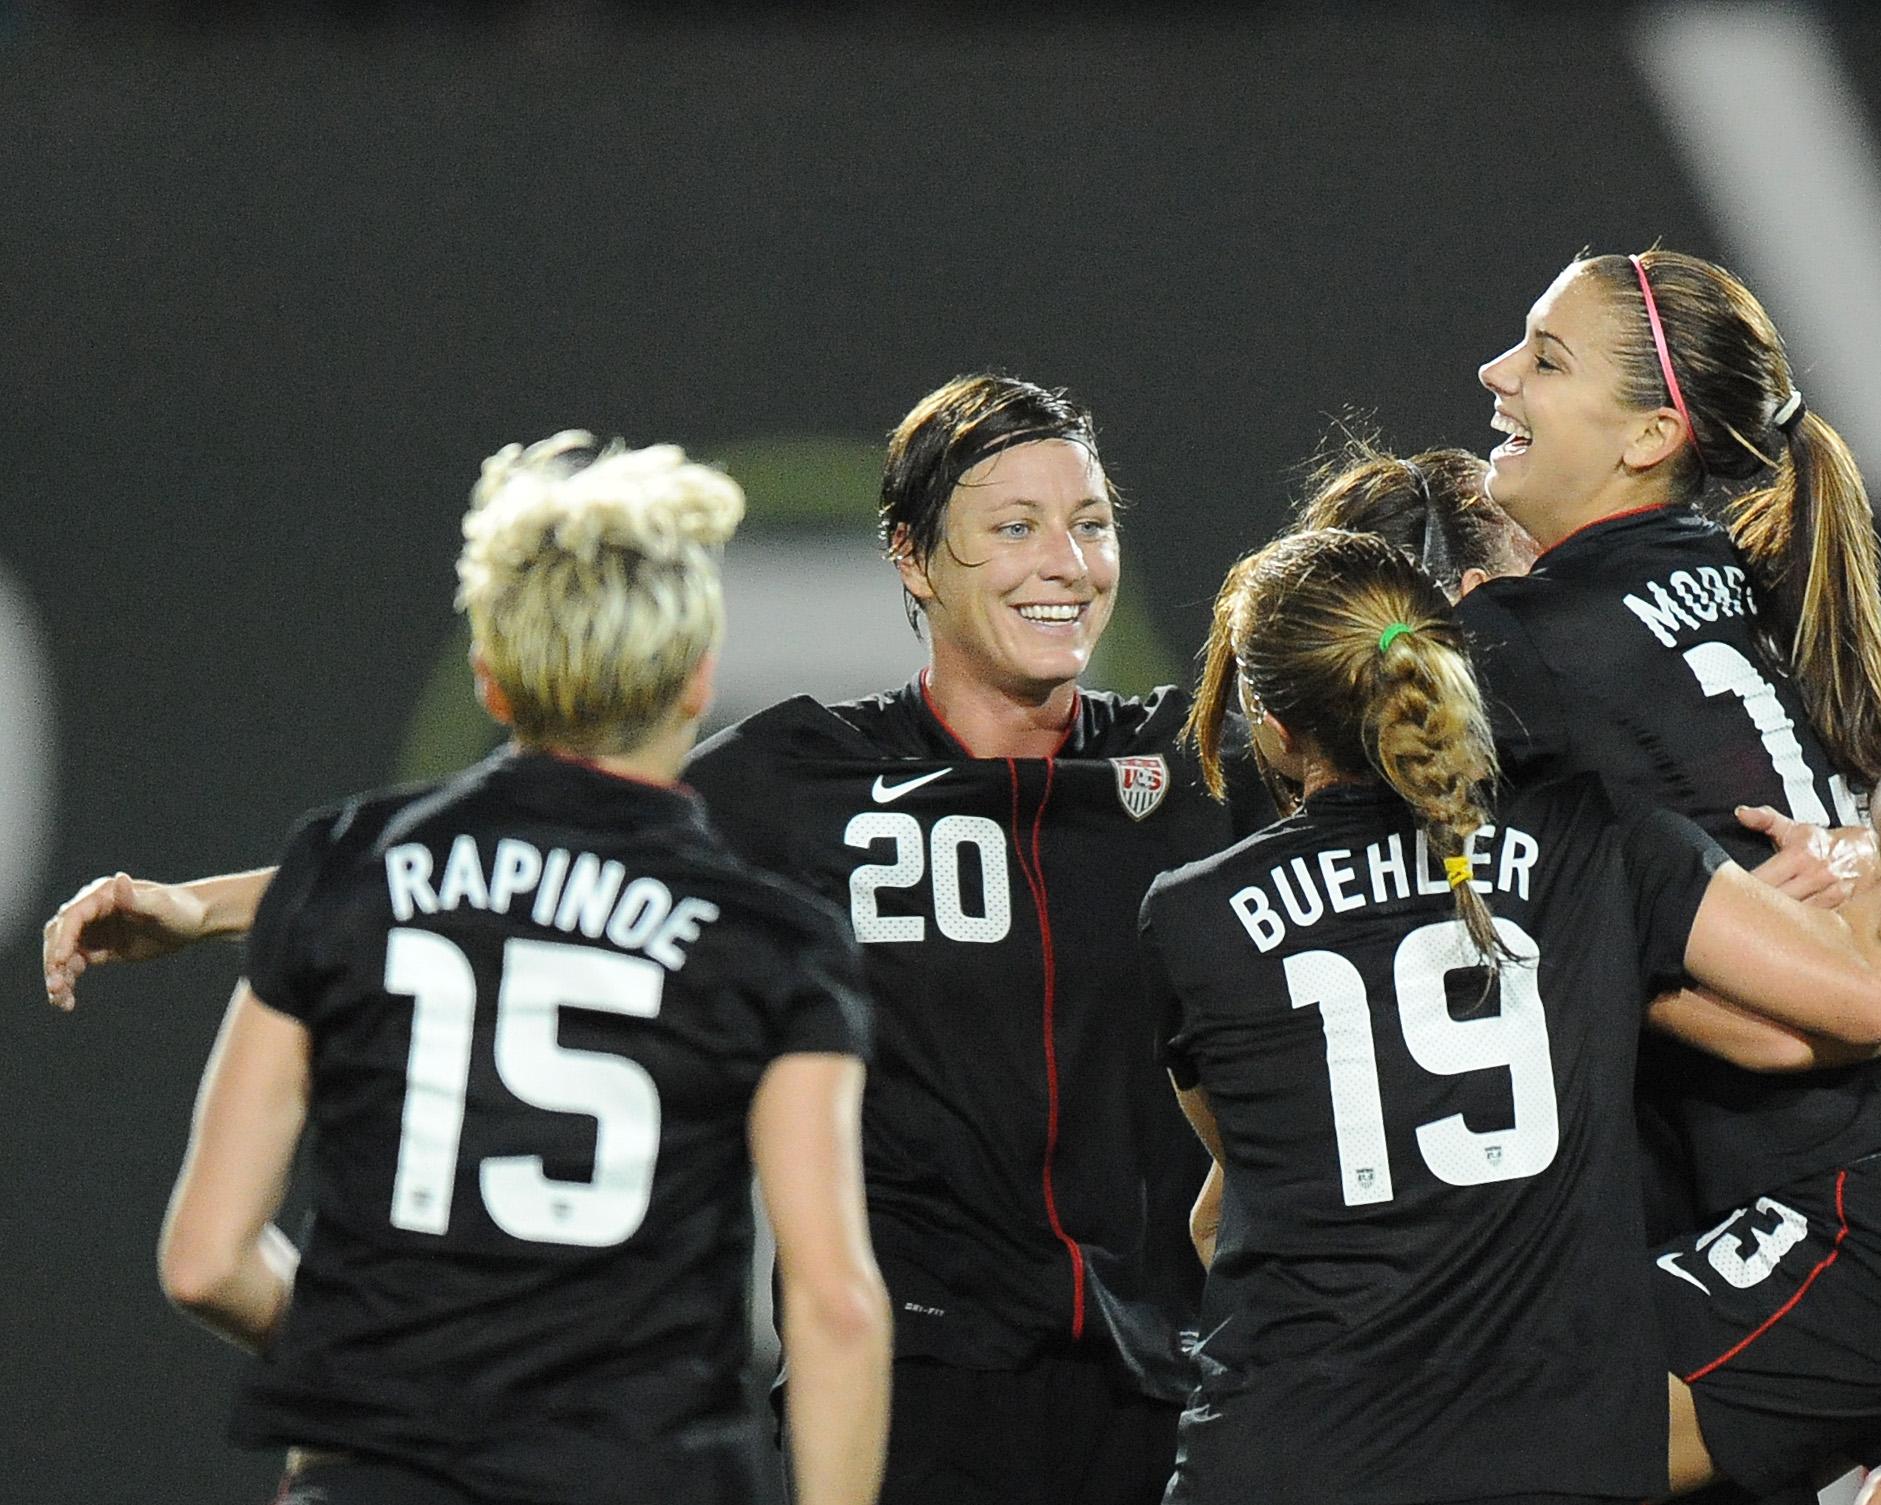 Abby Wambach celebrates her first goal in a 3-0 win over Canada on Thursday. (Photo Credit: Patricia Giobetti/http://www.printroom.com/pro/psgiobetti)